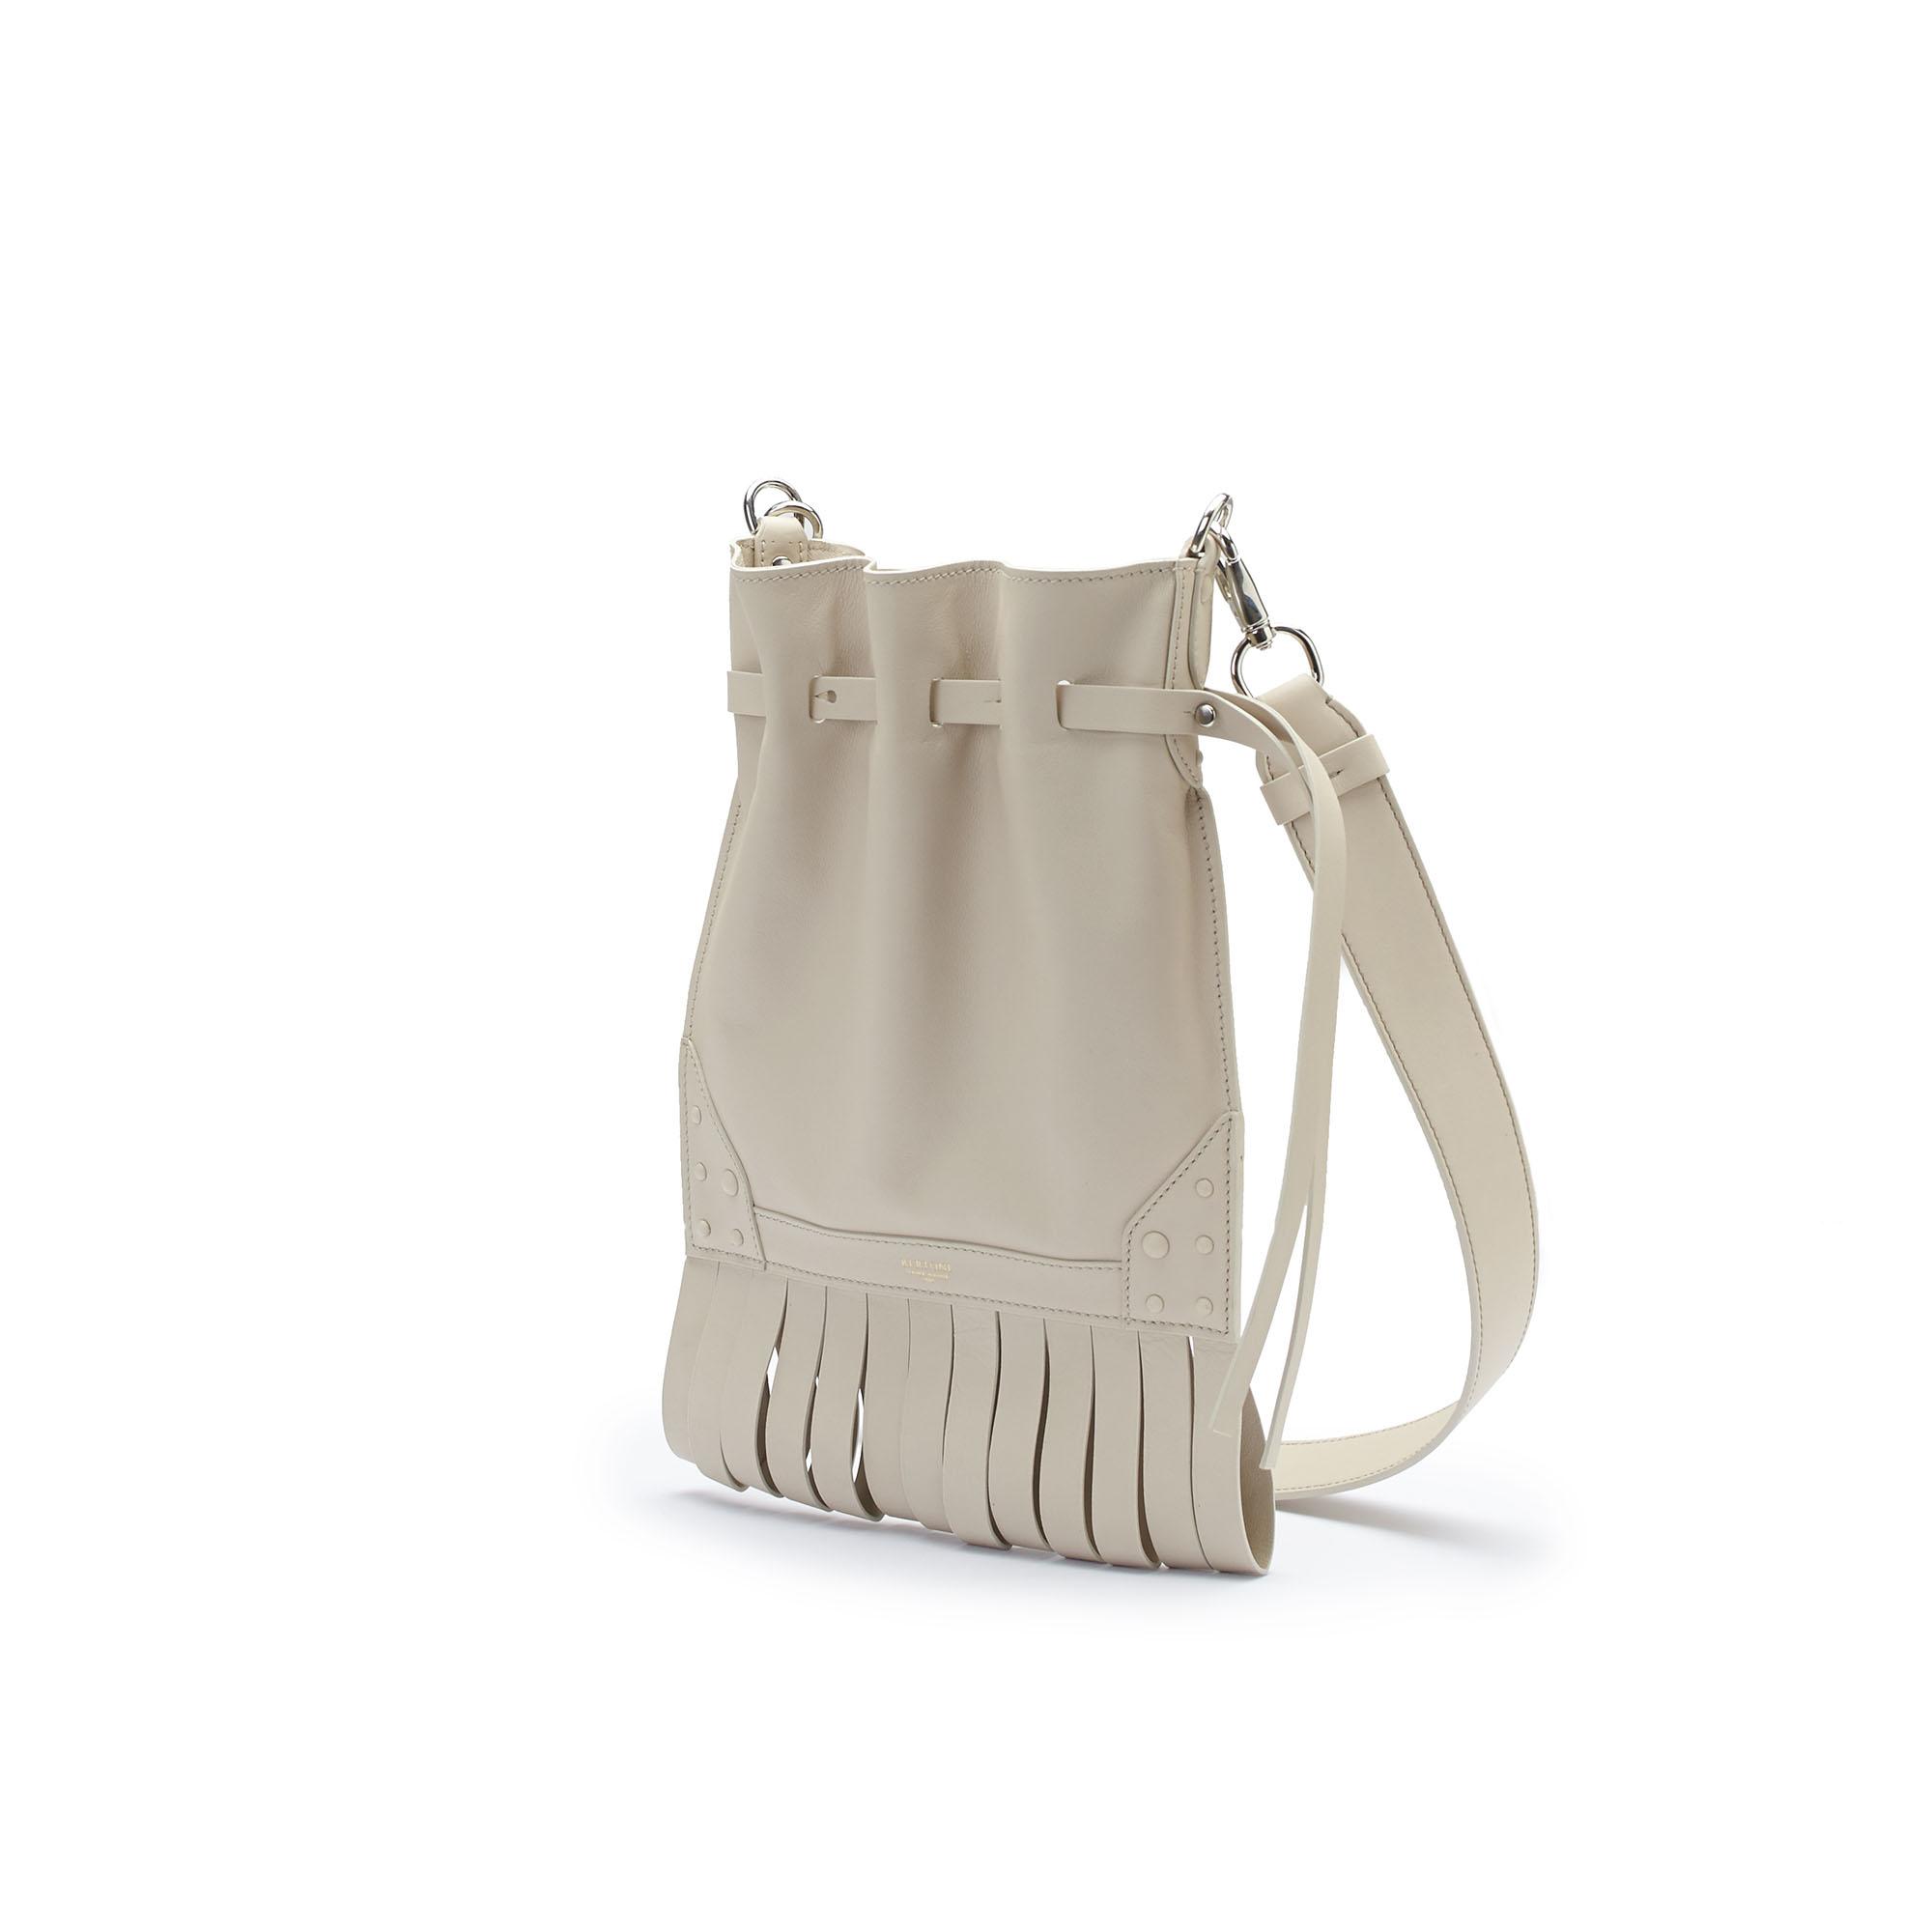 The Ivory soft calf Fanny Fringe bag by Bertoni 1949 02